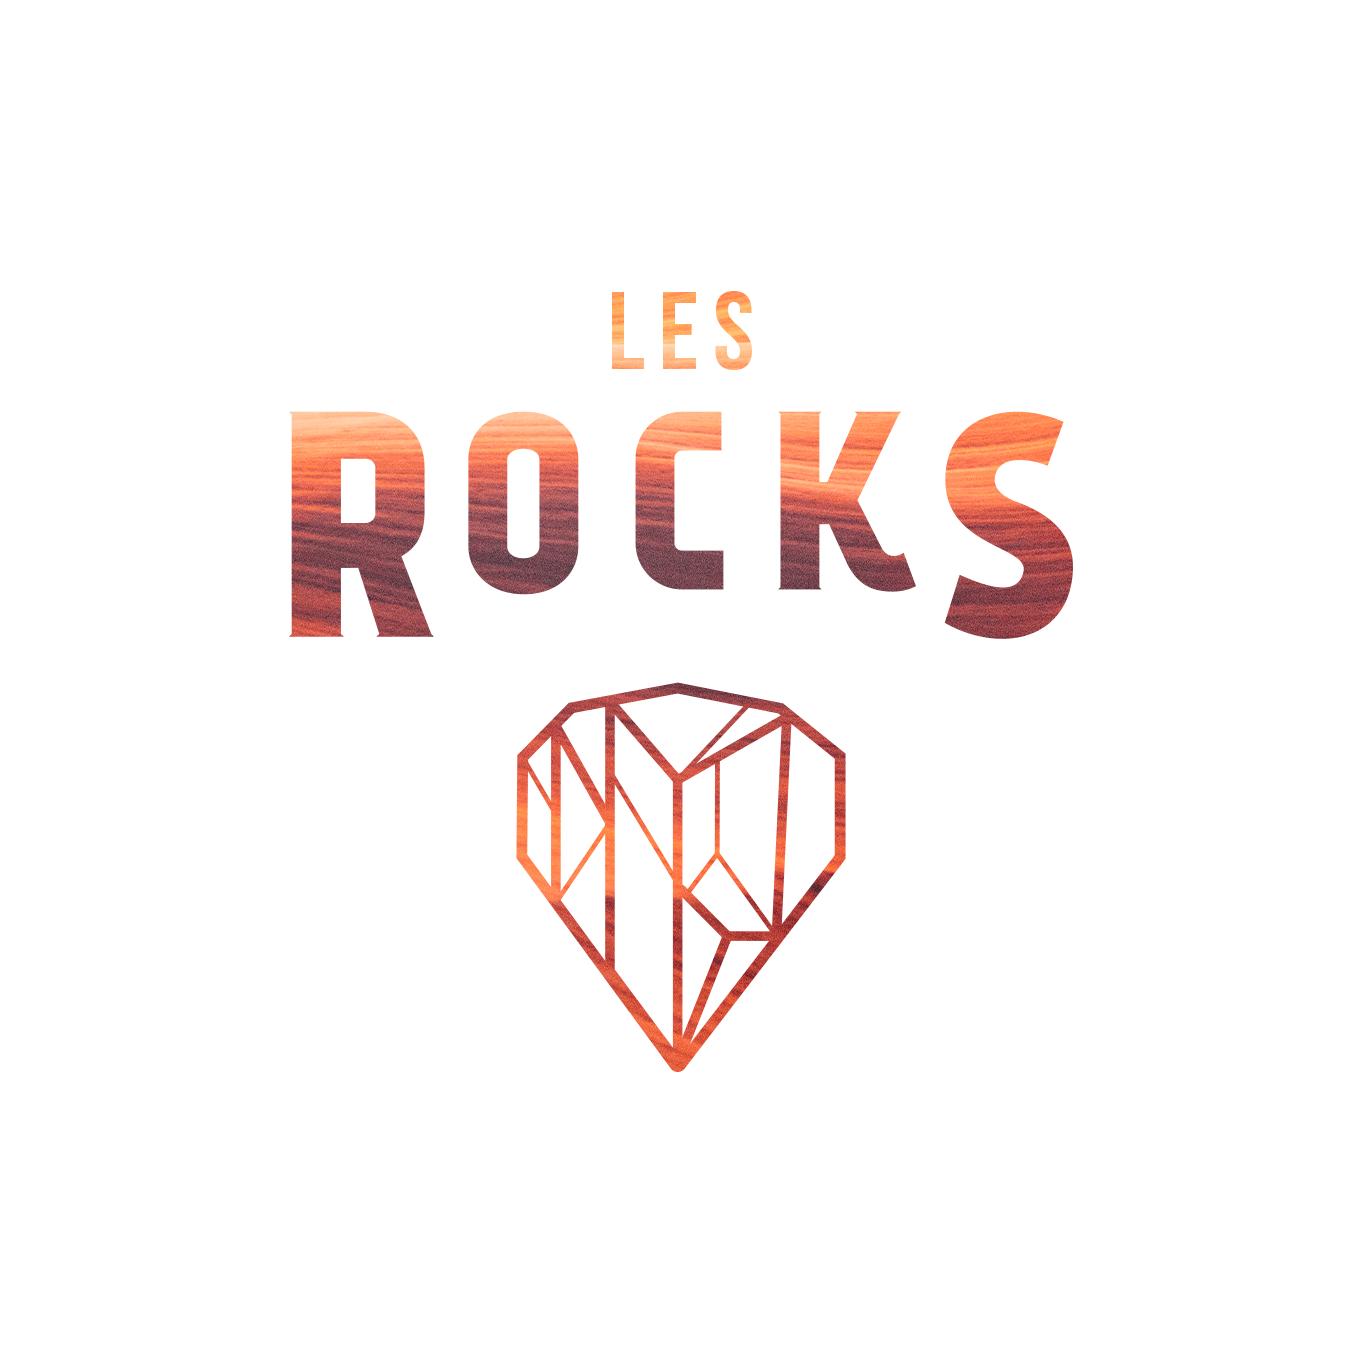 Les rocks